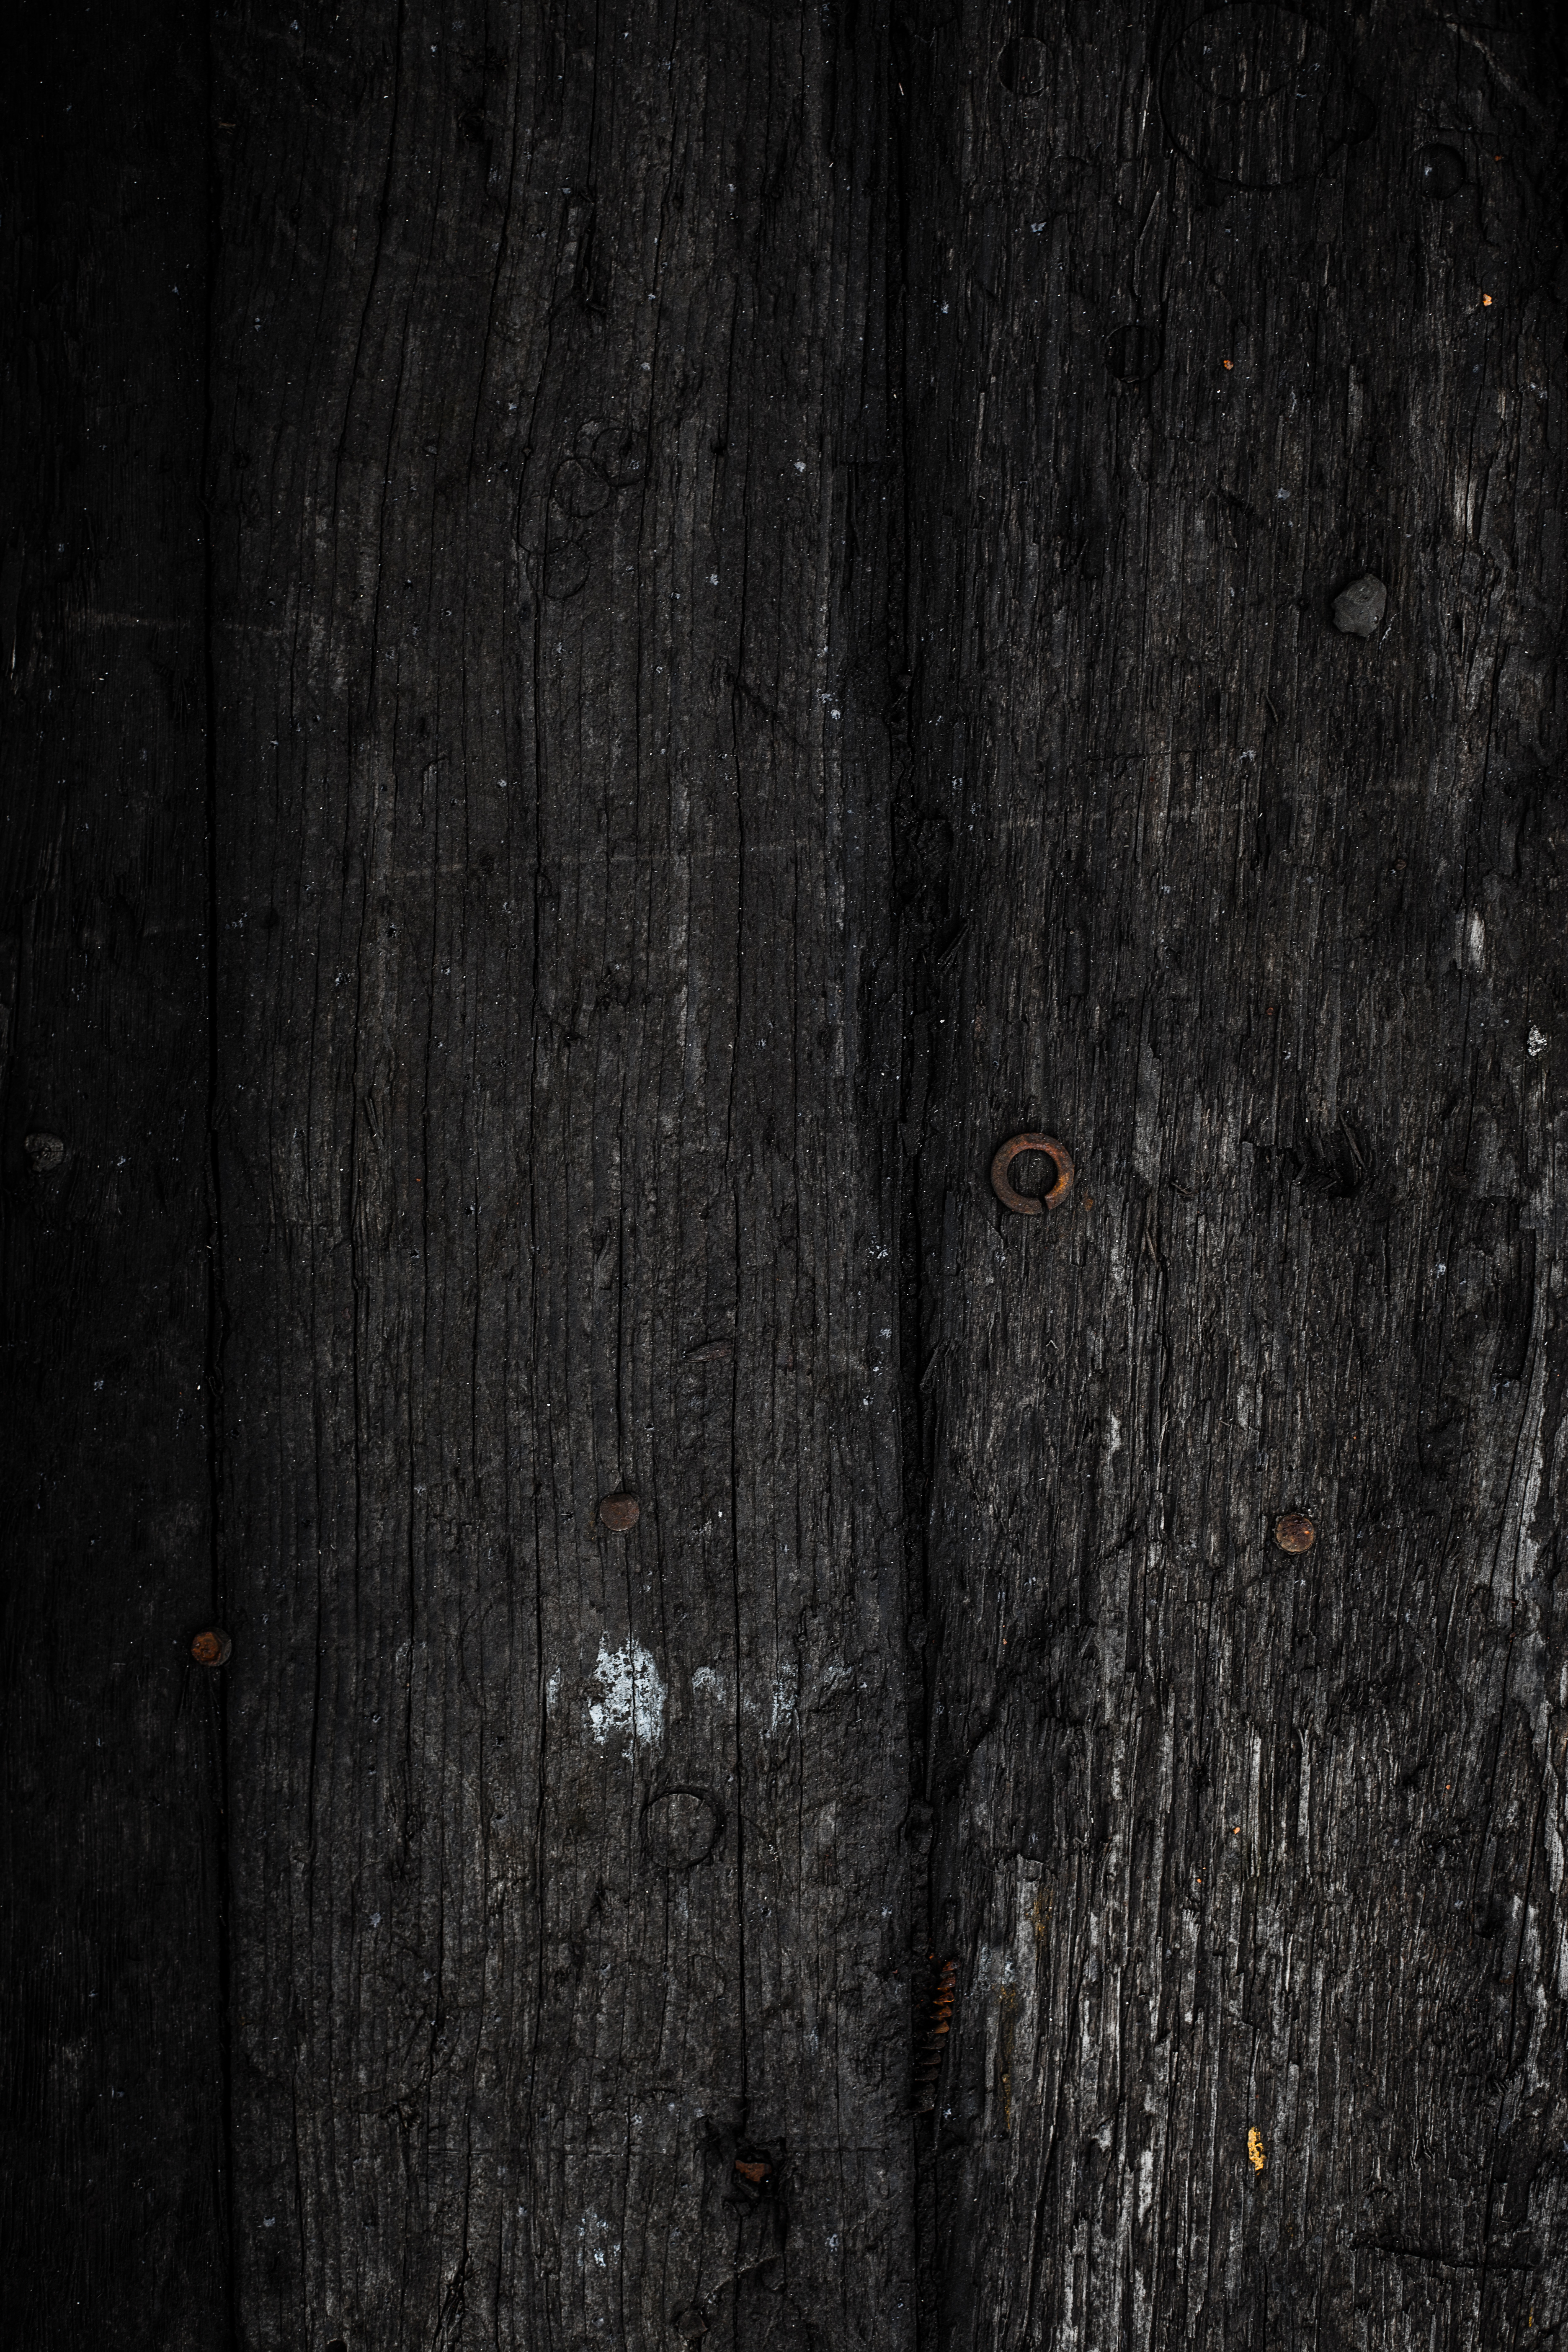 Black wood texture photo